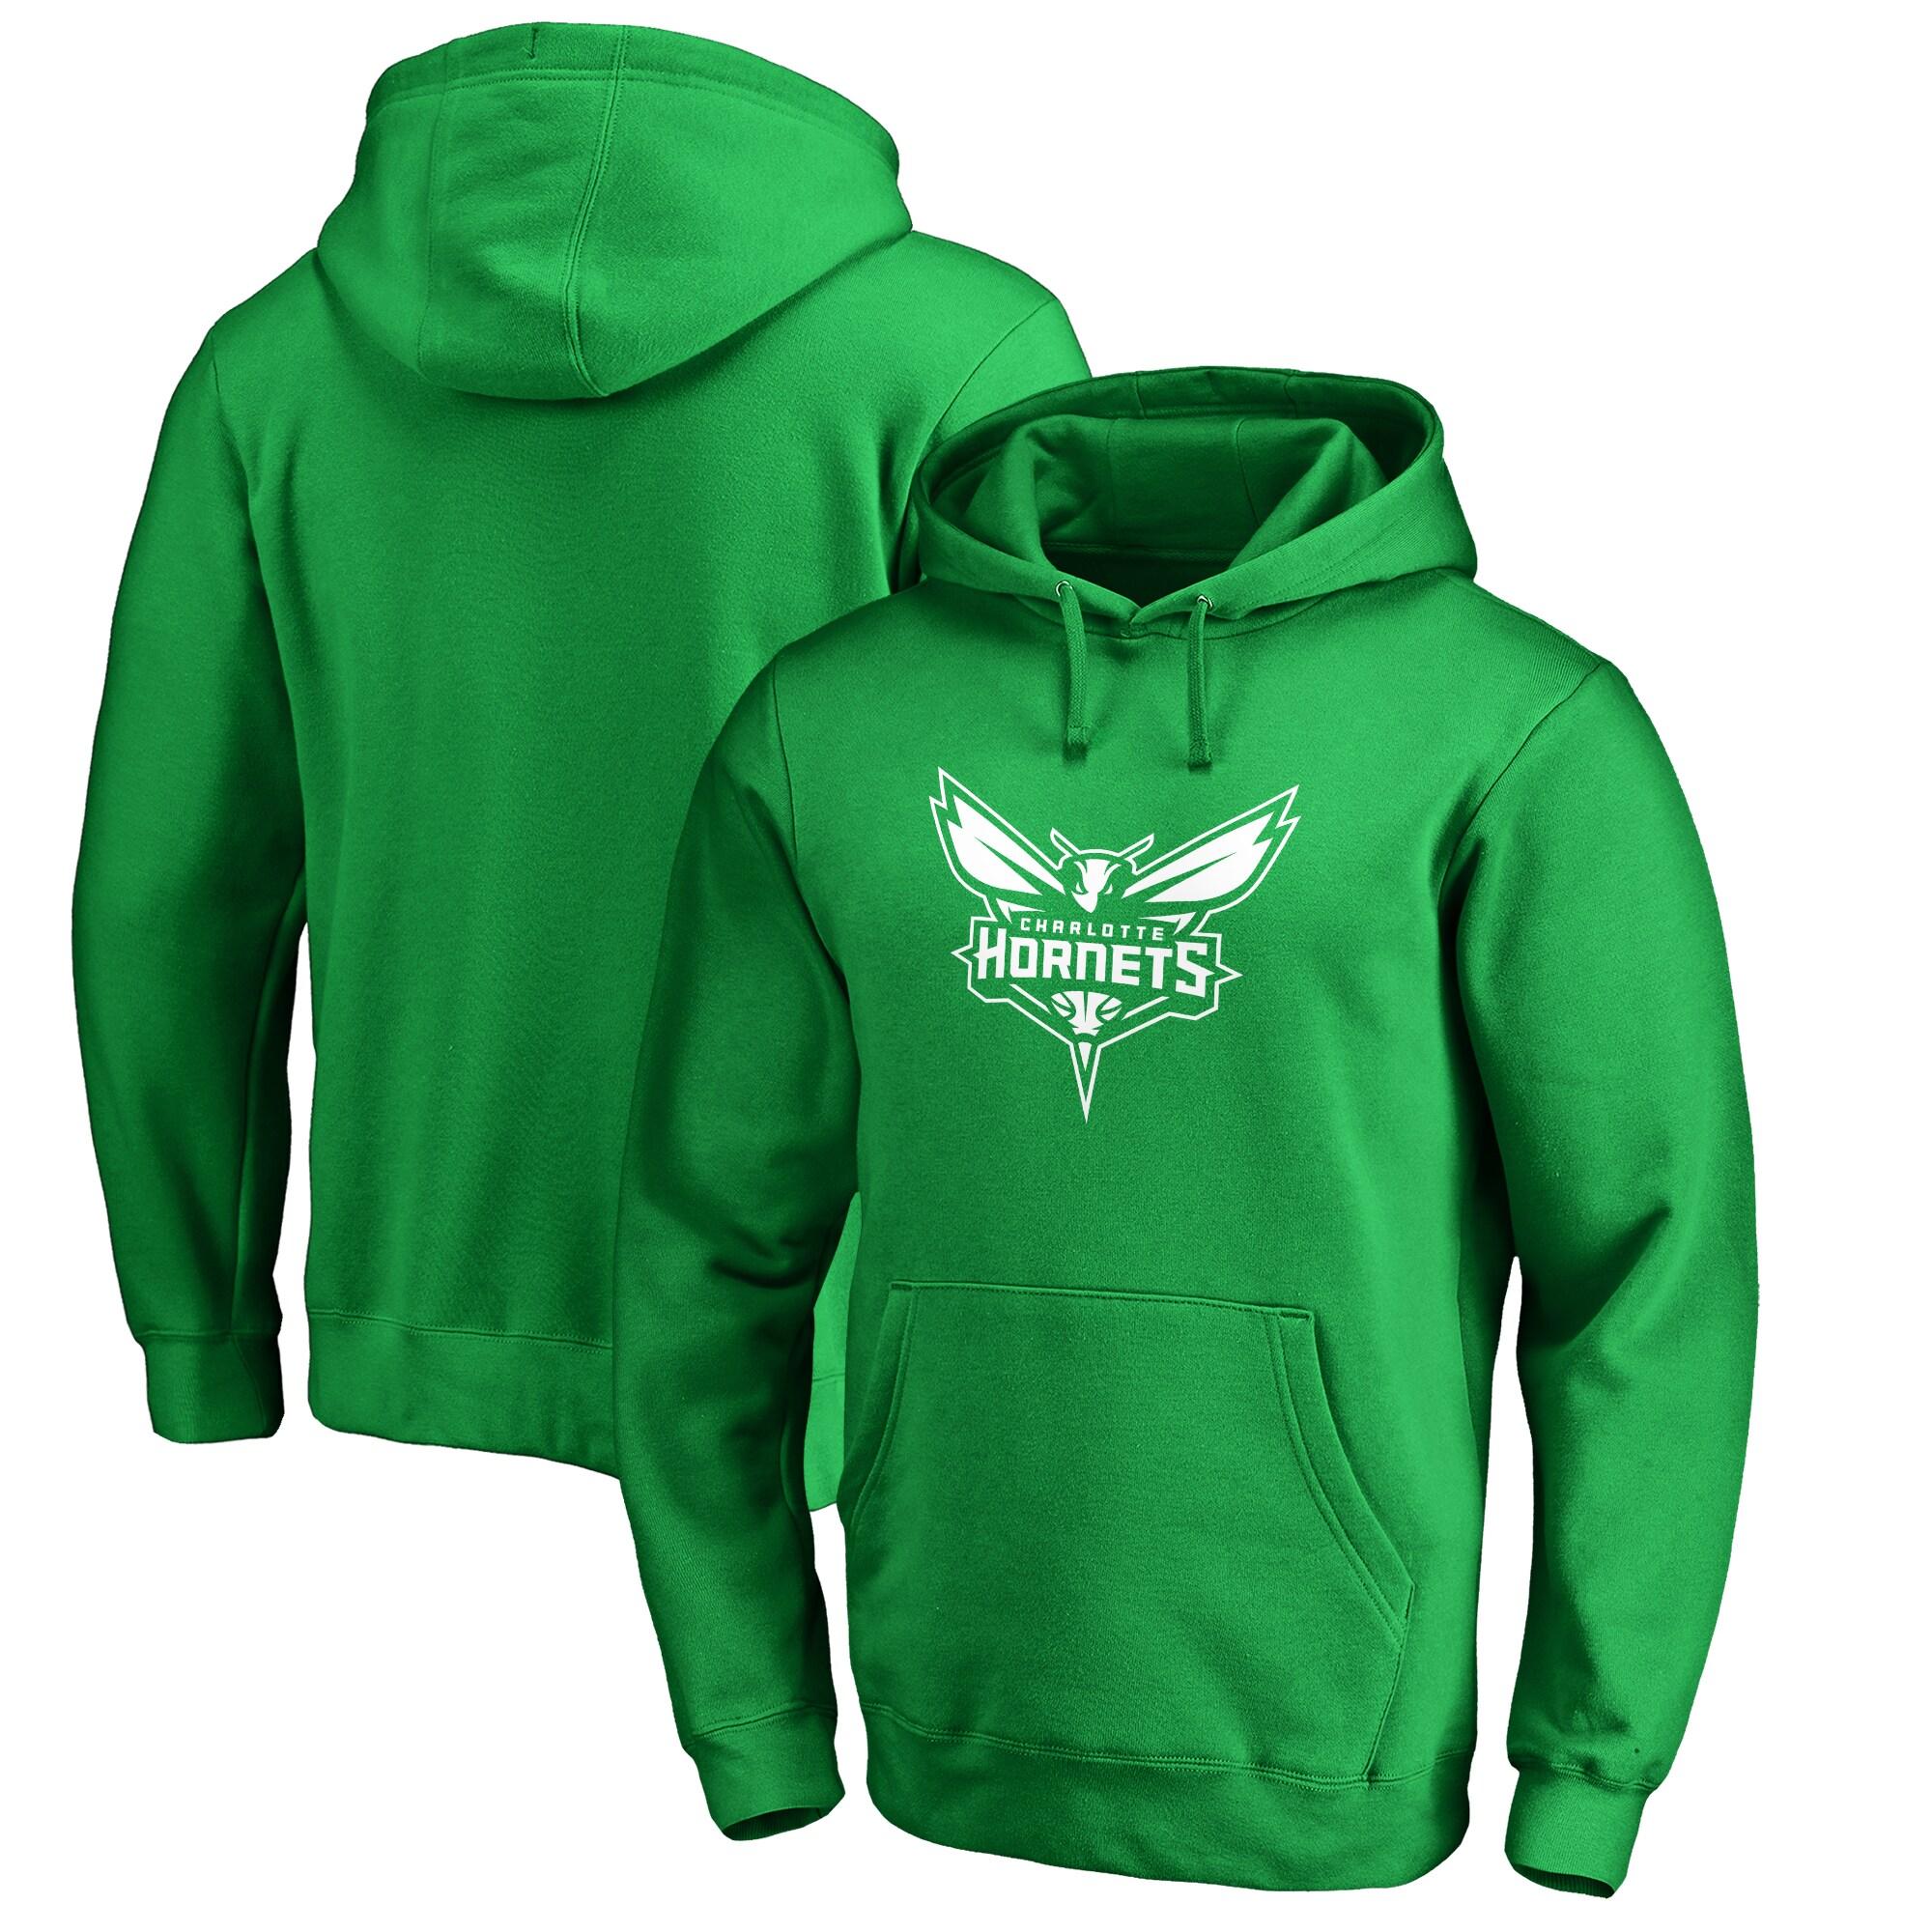 Charlotte Hornets Fanatics Branded St. Patrick's Day White Logo Pullover Hoodie - Green